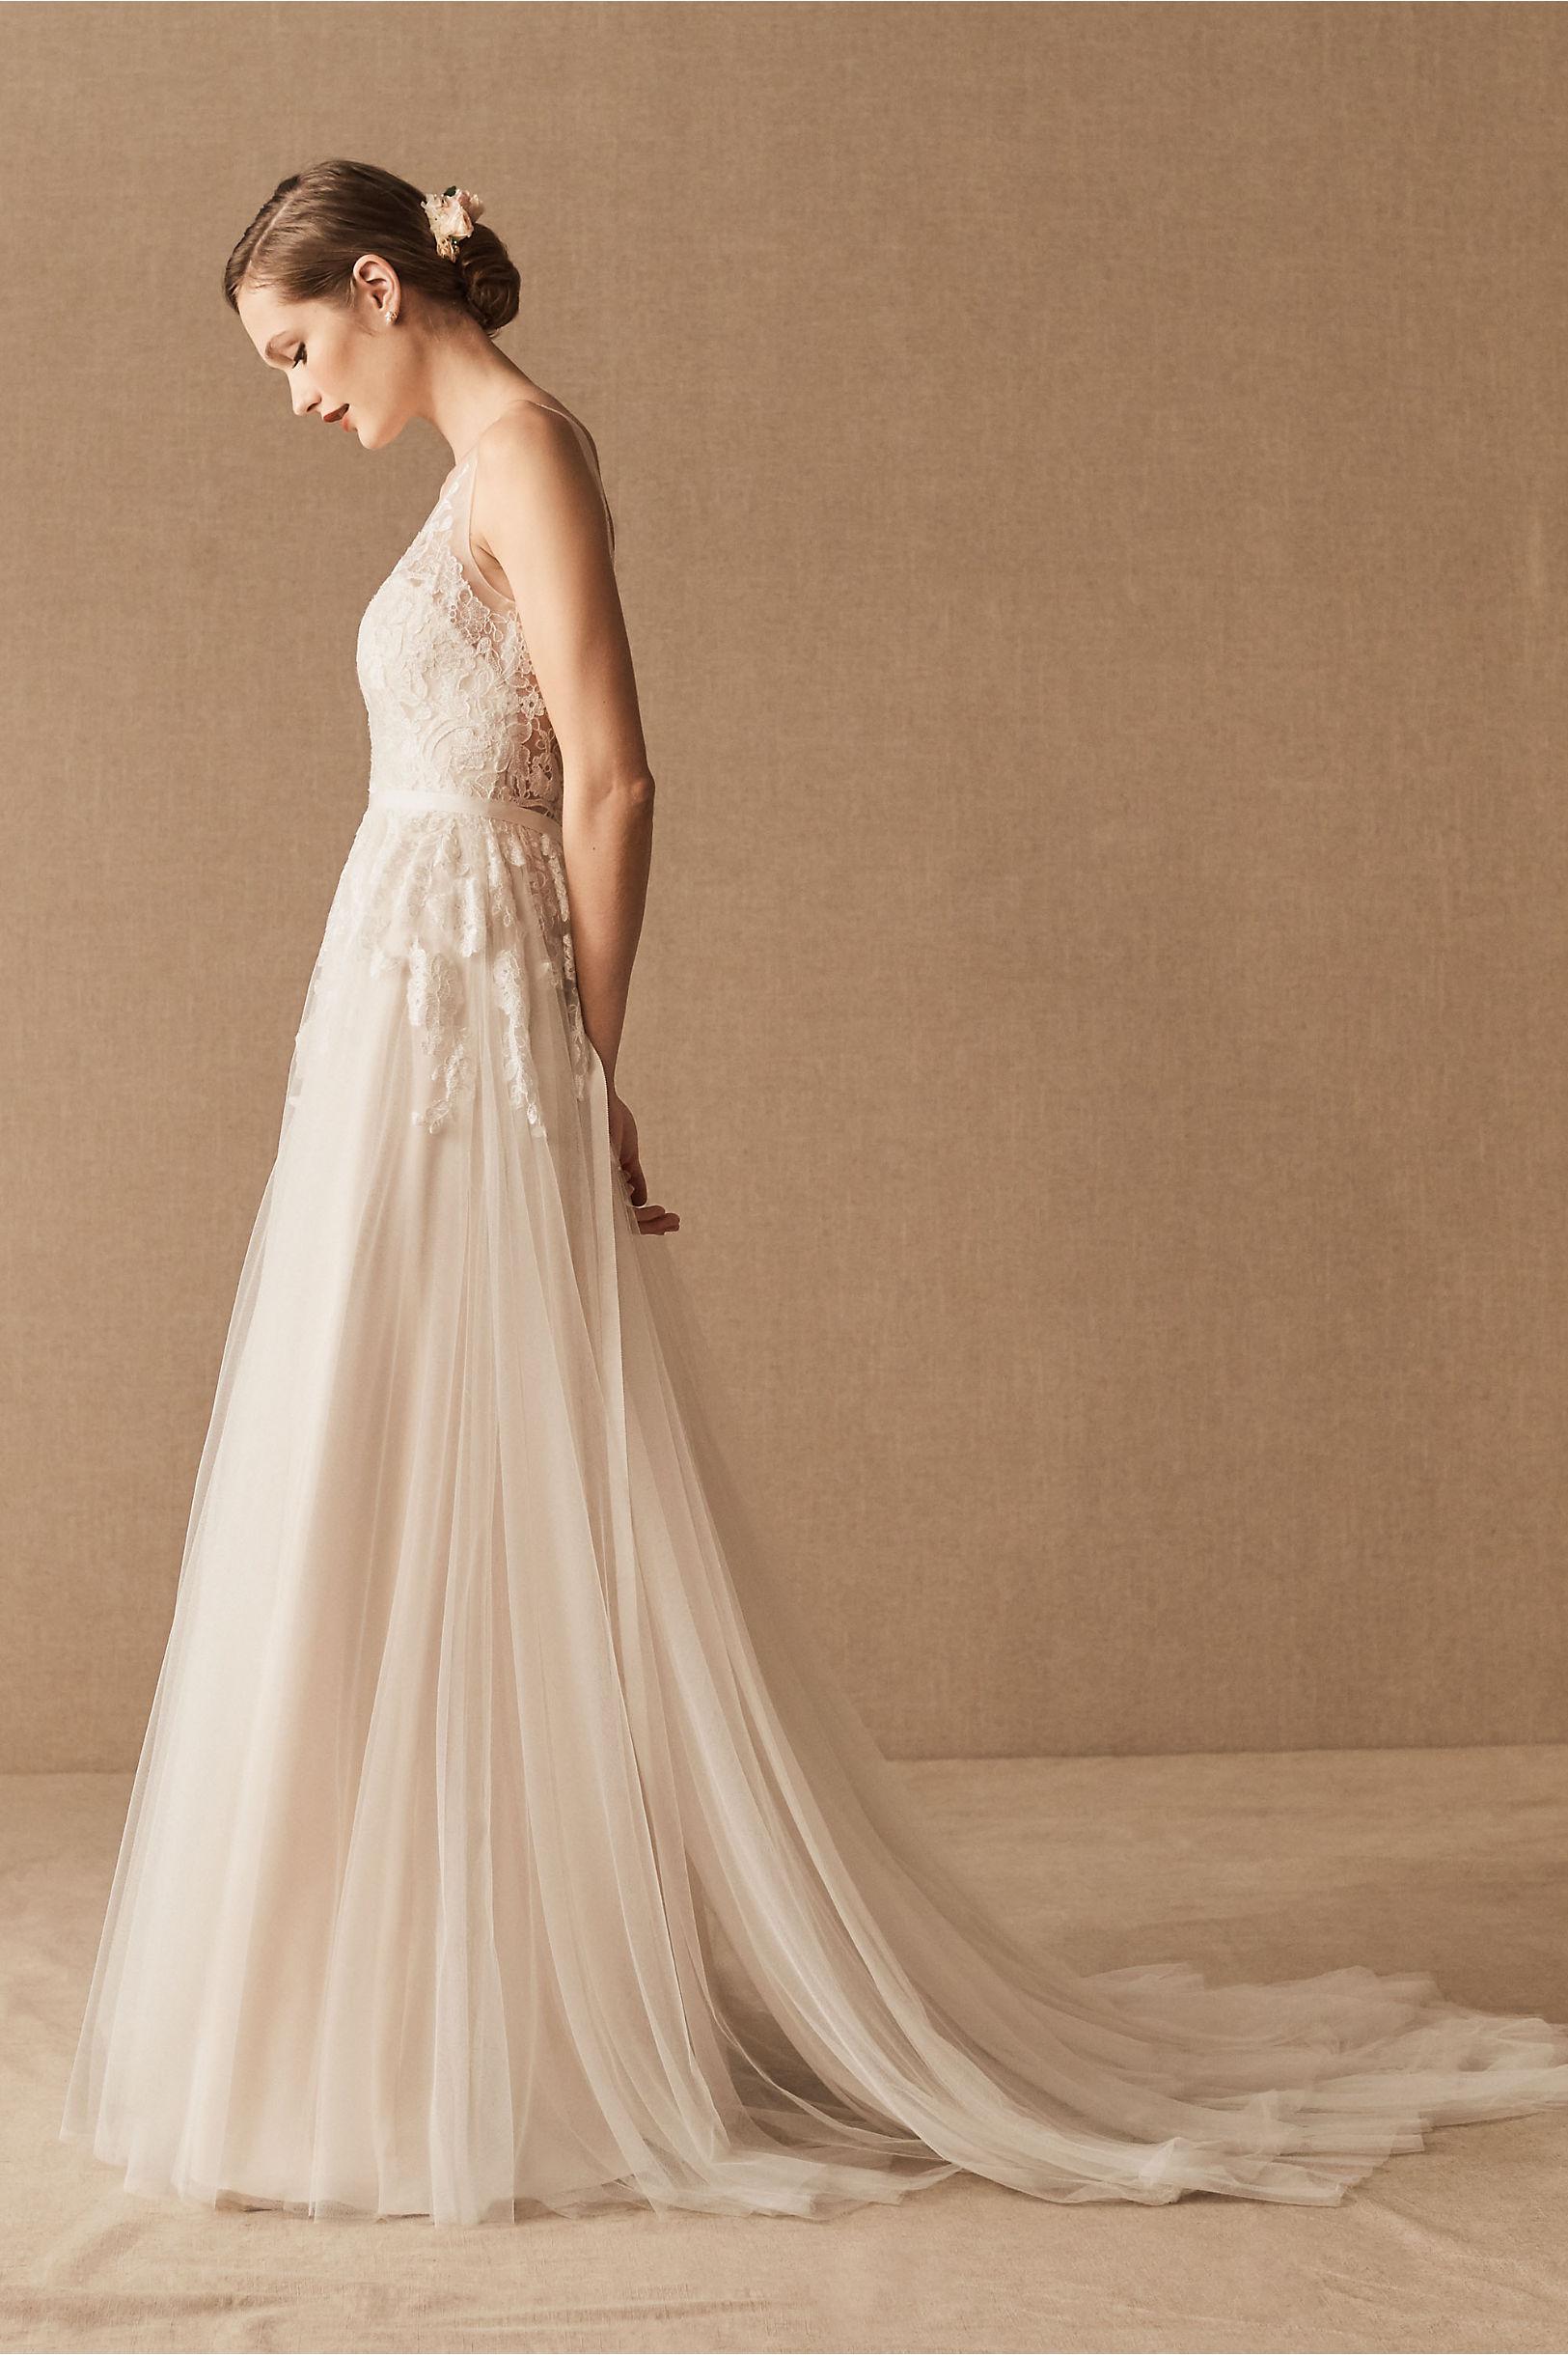 Reagan Gown & Anastasia Cape in Bride | BHLDN